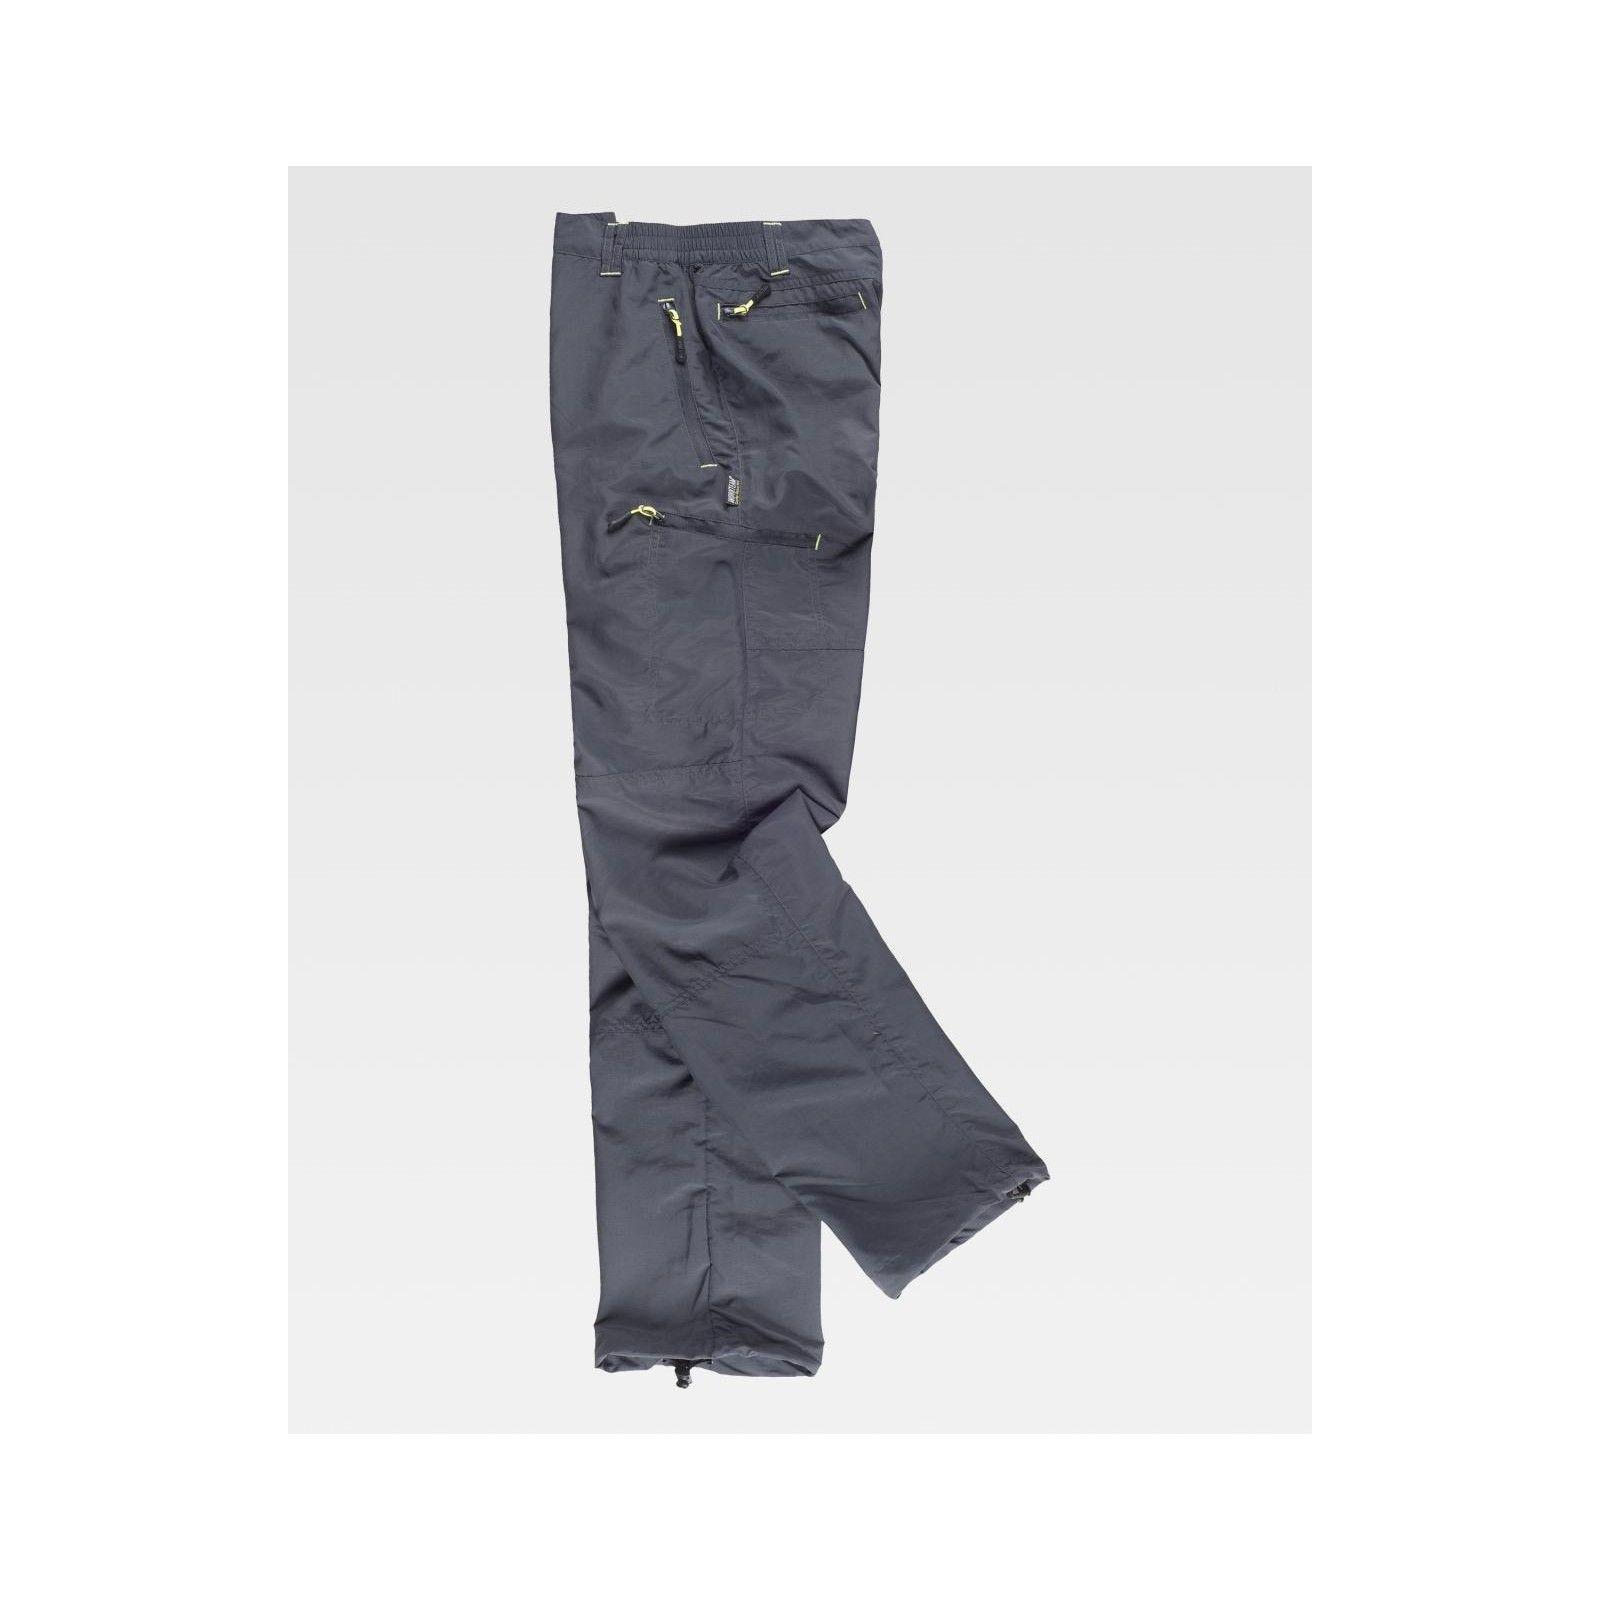 Pantalone da montagna nylon ripstop